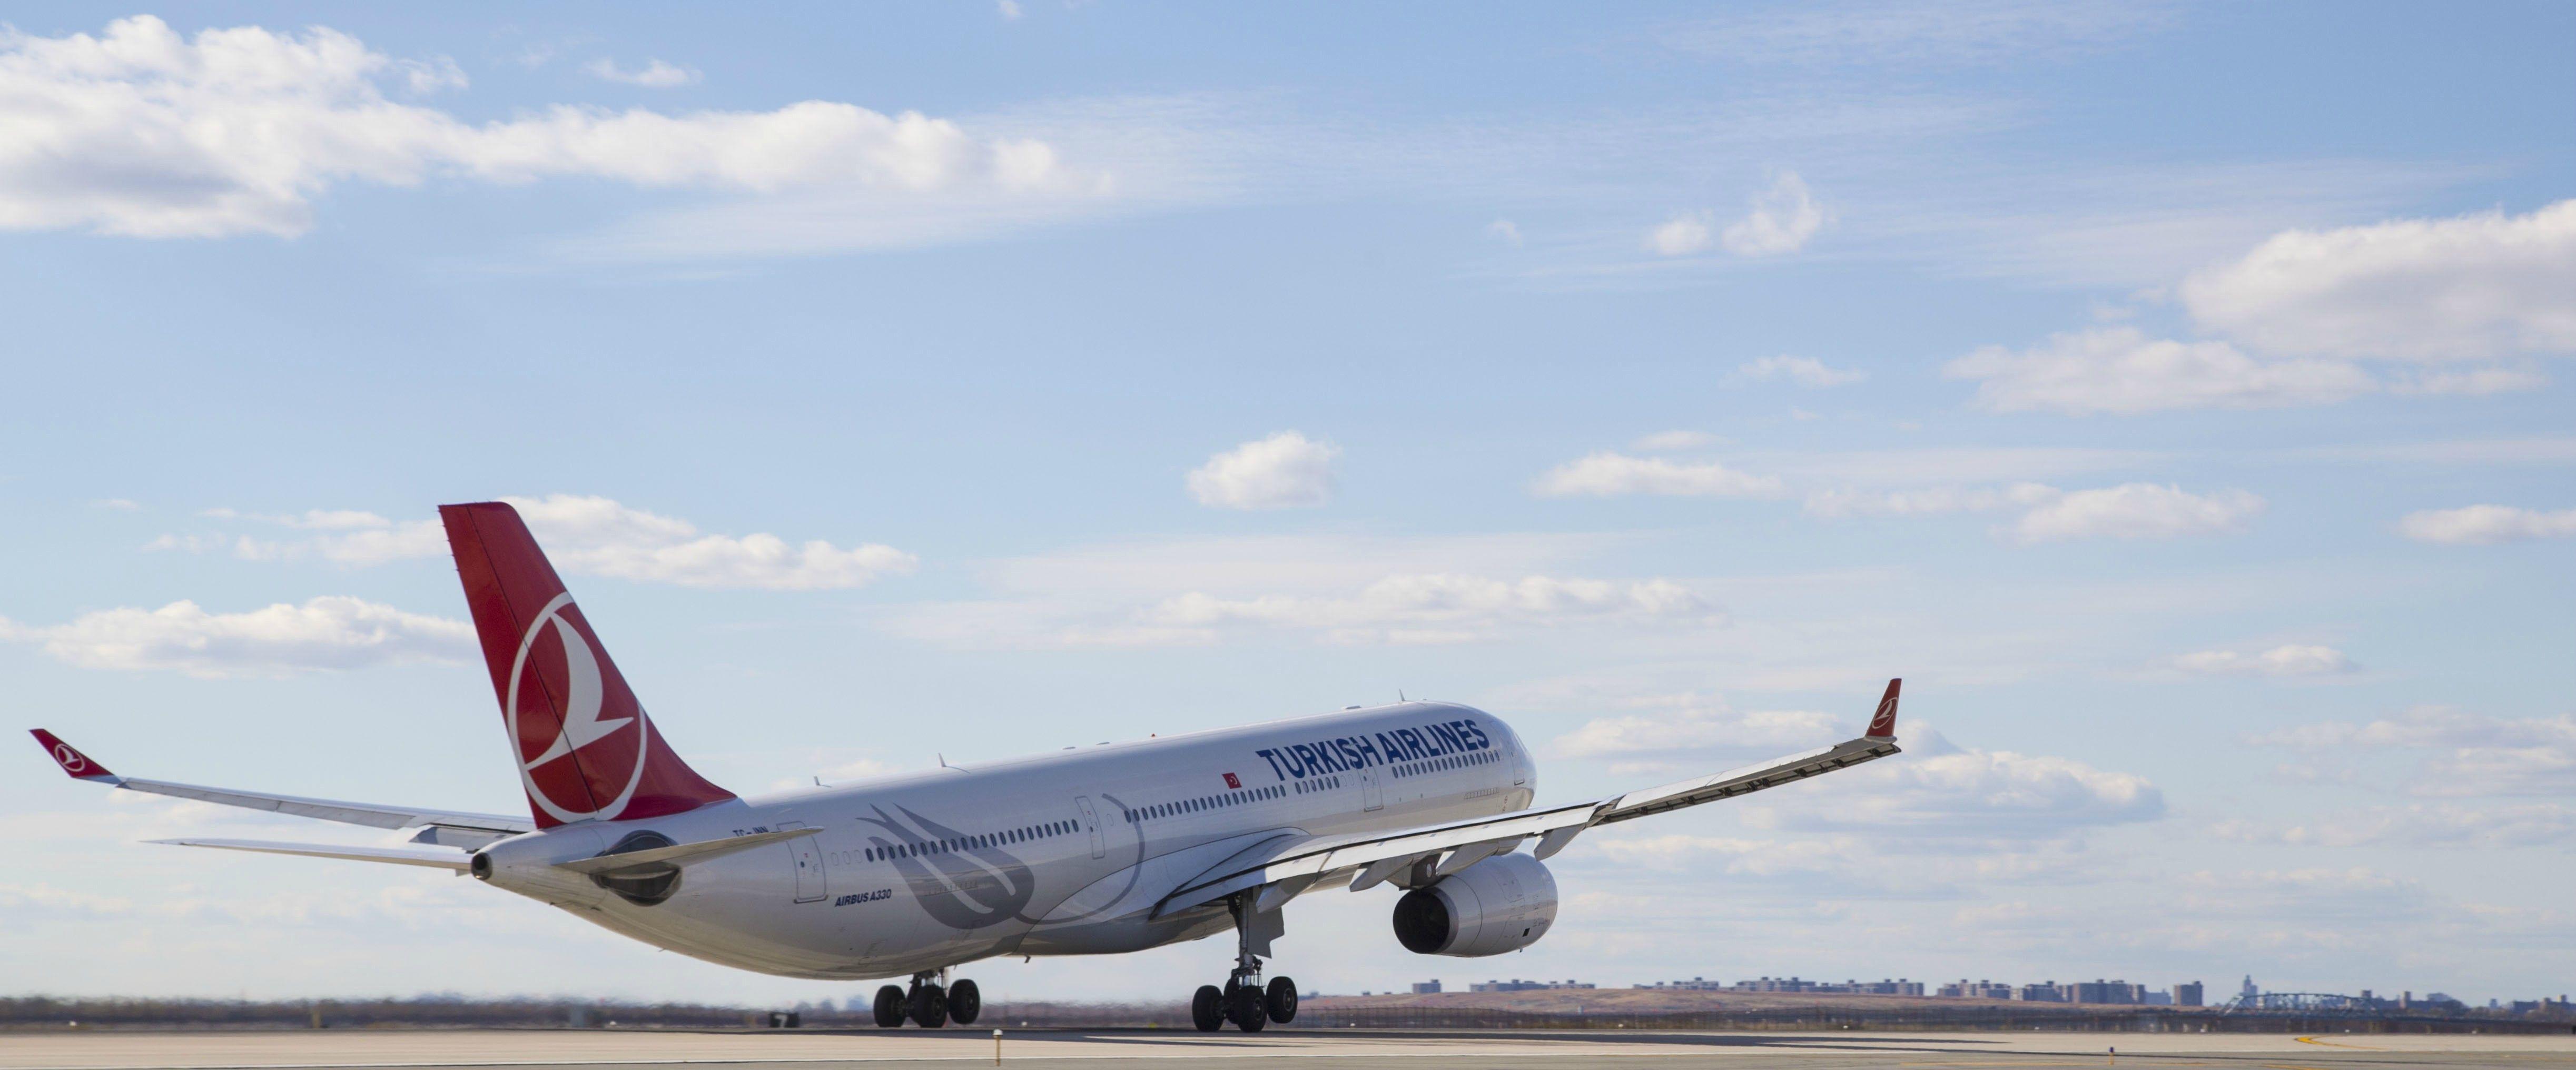 Turkish Airlines A330 rotating off 22R at JFK Avion de